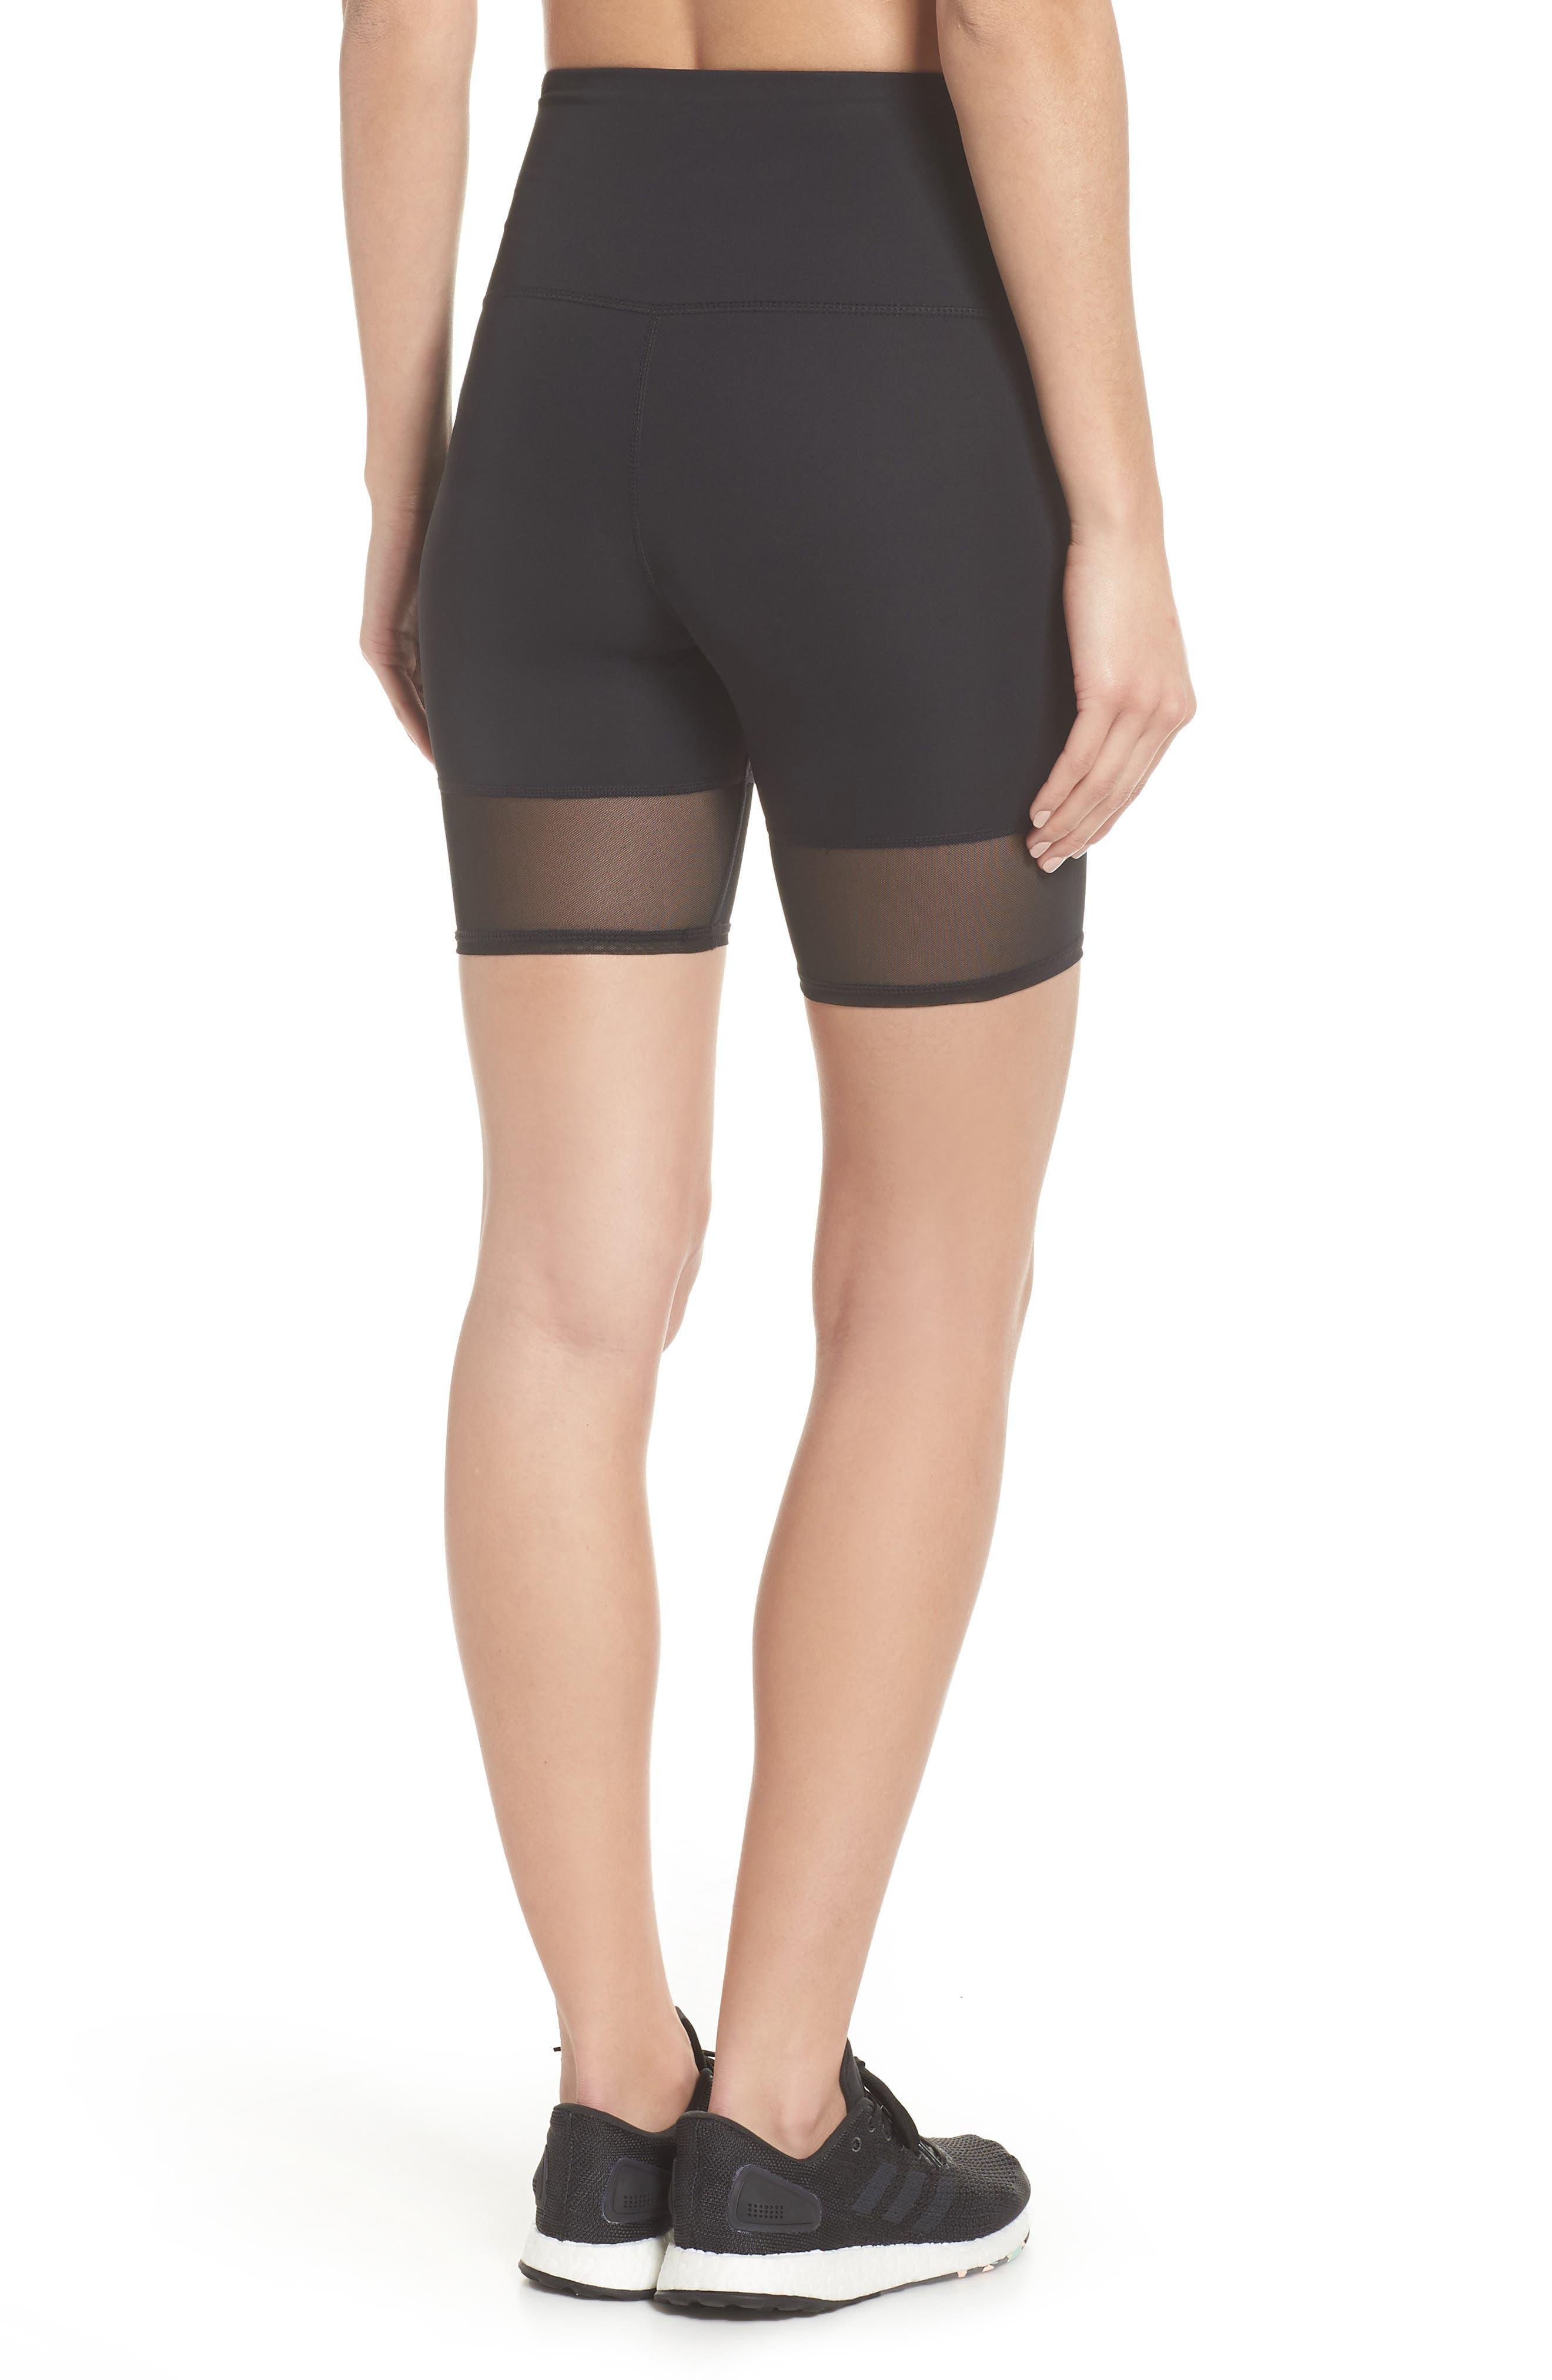 Mia Vision High Waist Mesh Bike Shorts,                             Alternate thumbnail 2, color,                             Black